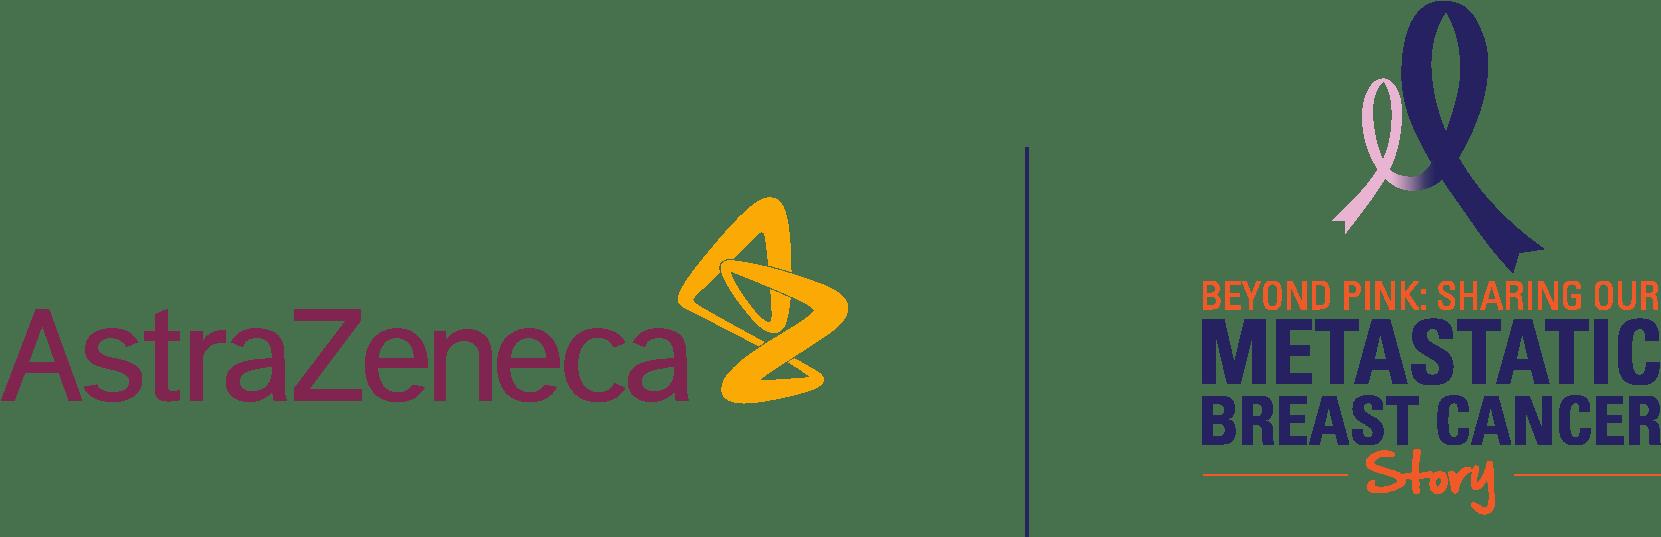 astrazeneca logo png pluspng astra